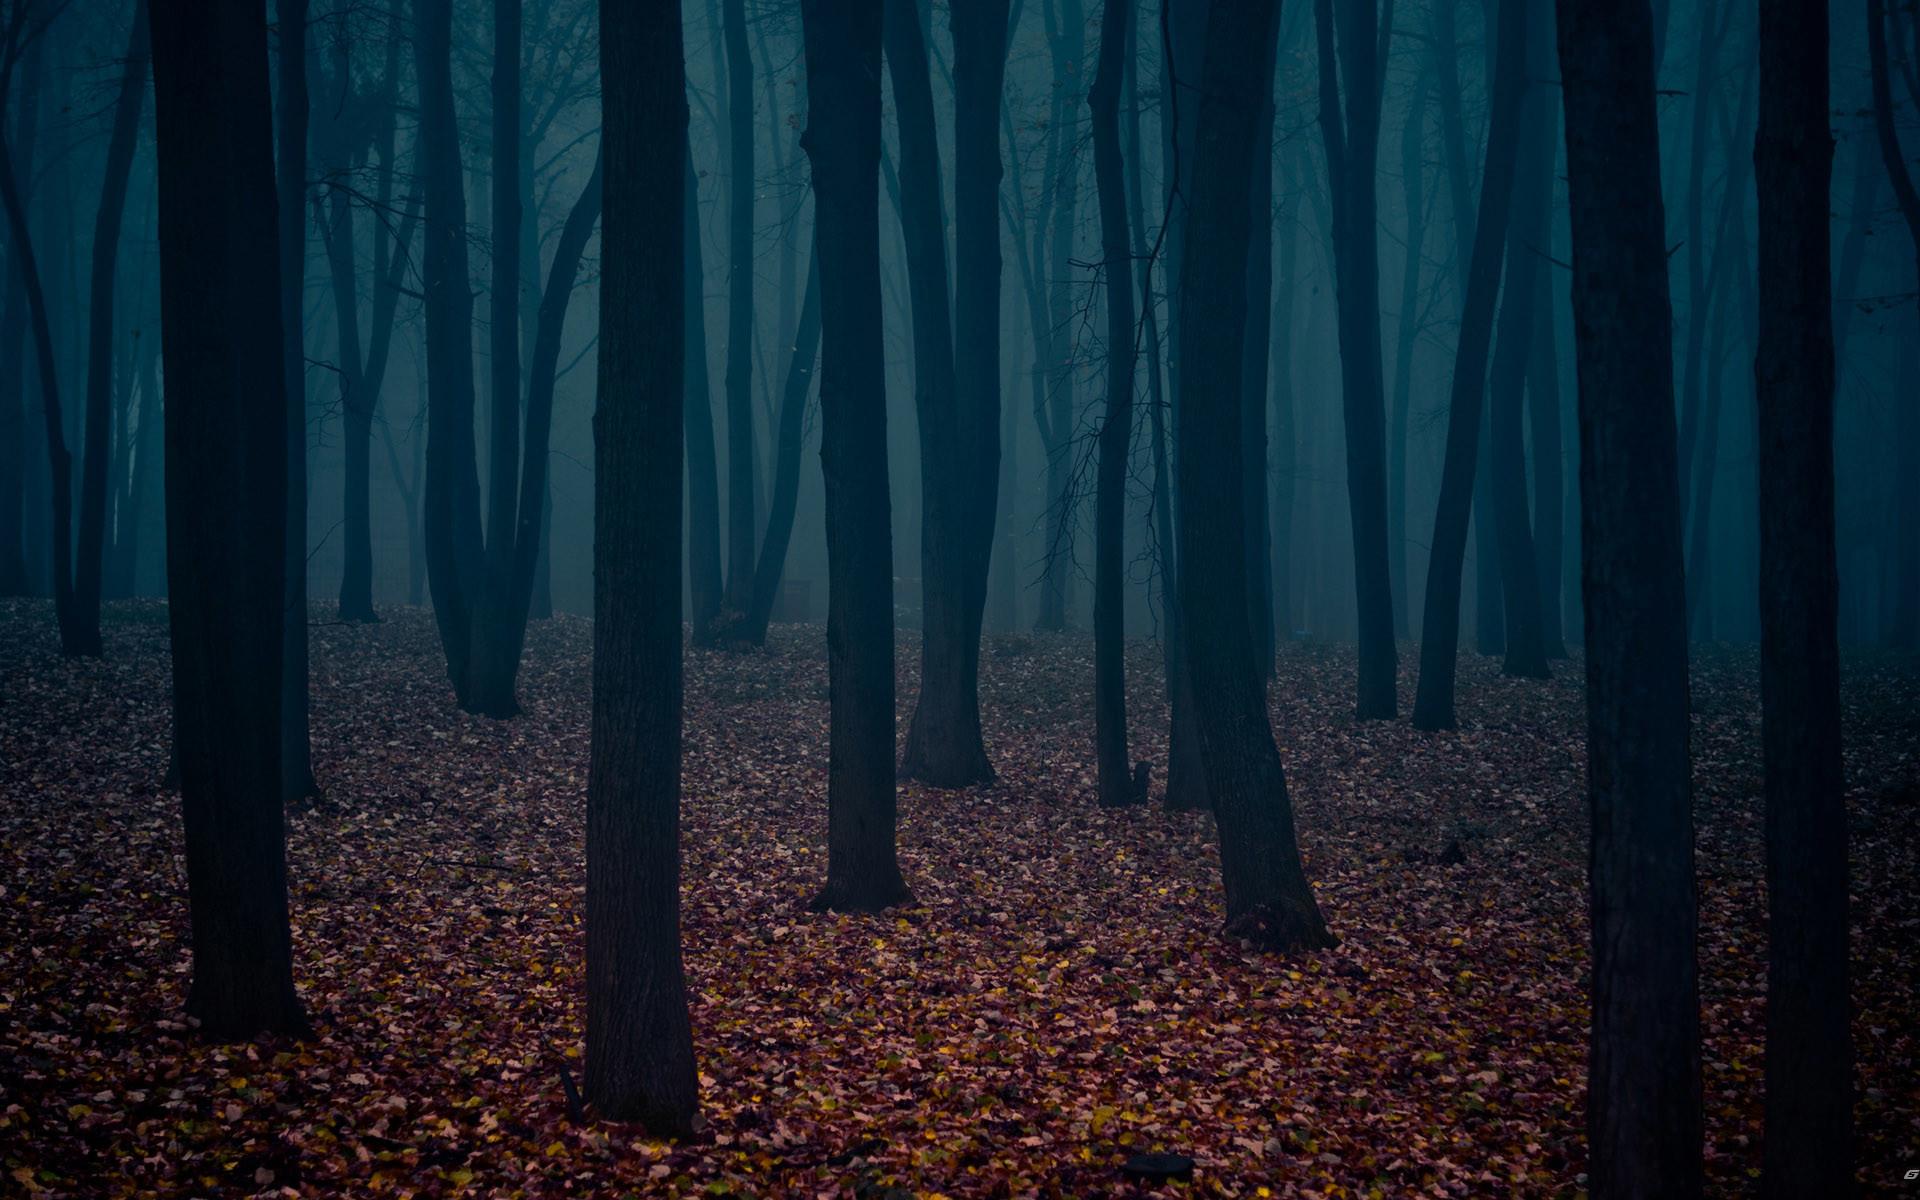 pin Dark clipart creepy forest #2